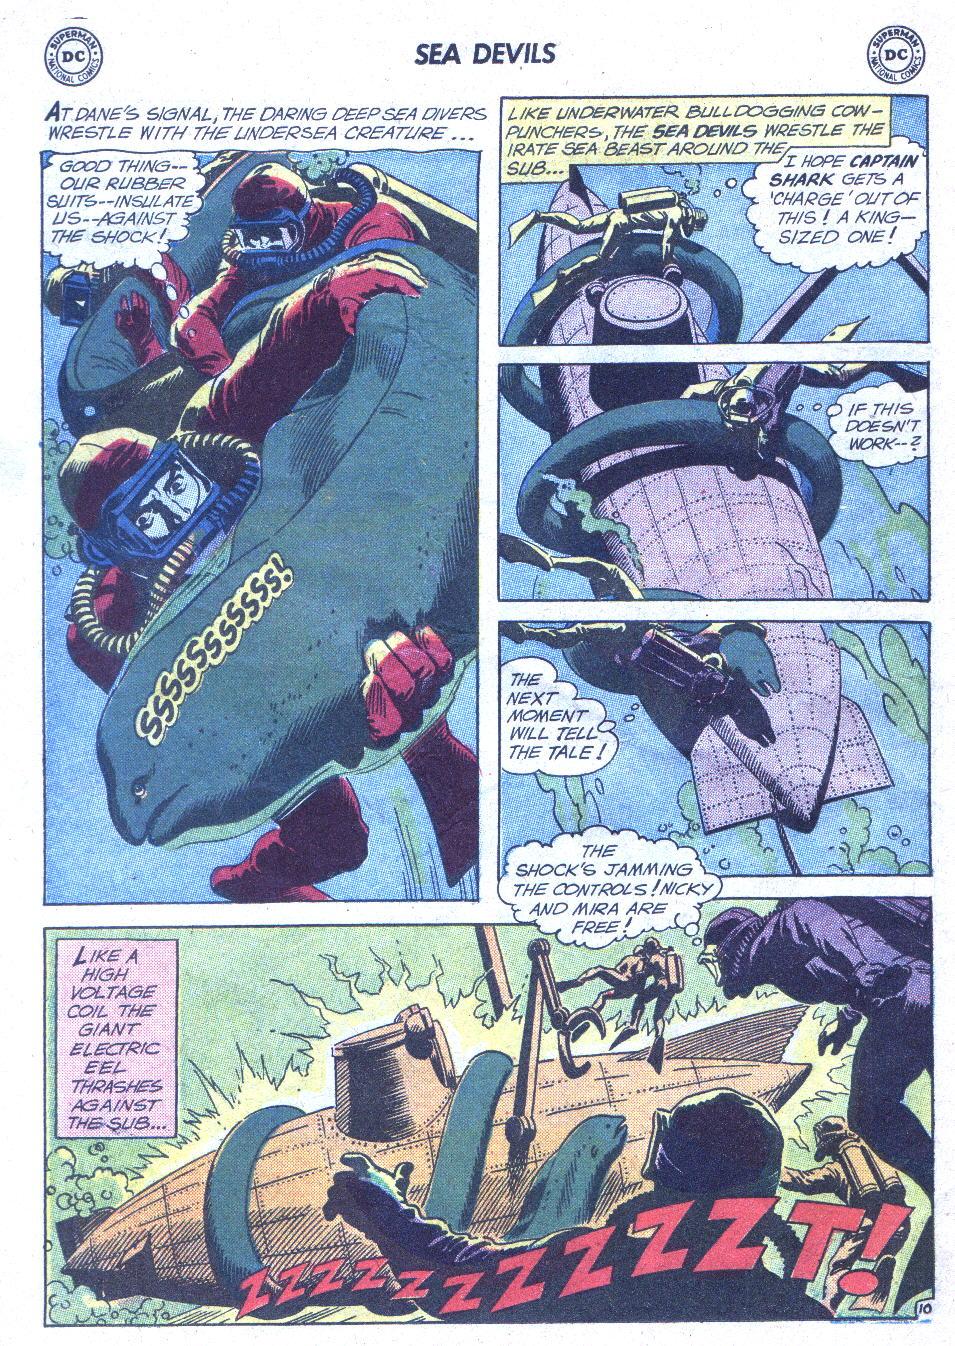 Read online Sea Devils comic -  Issue #1 - 31